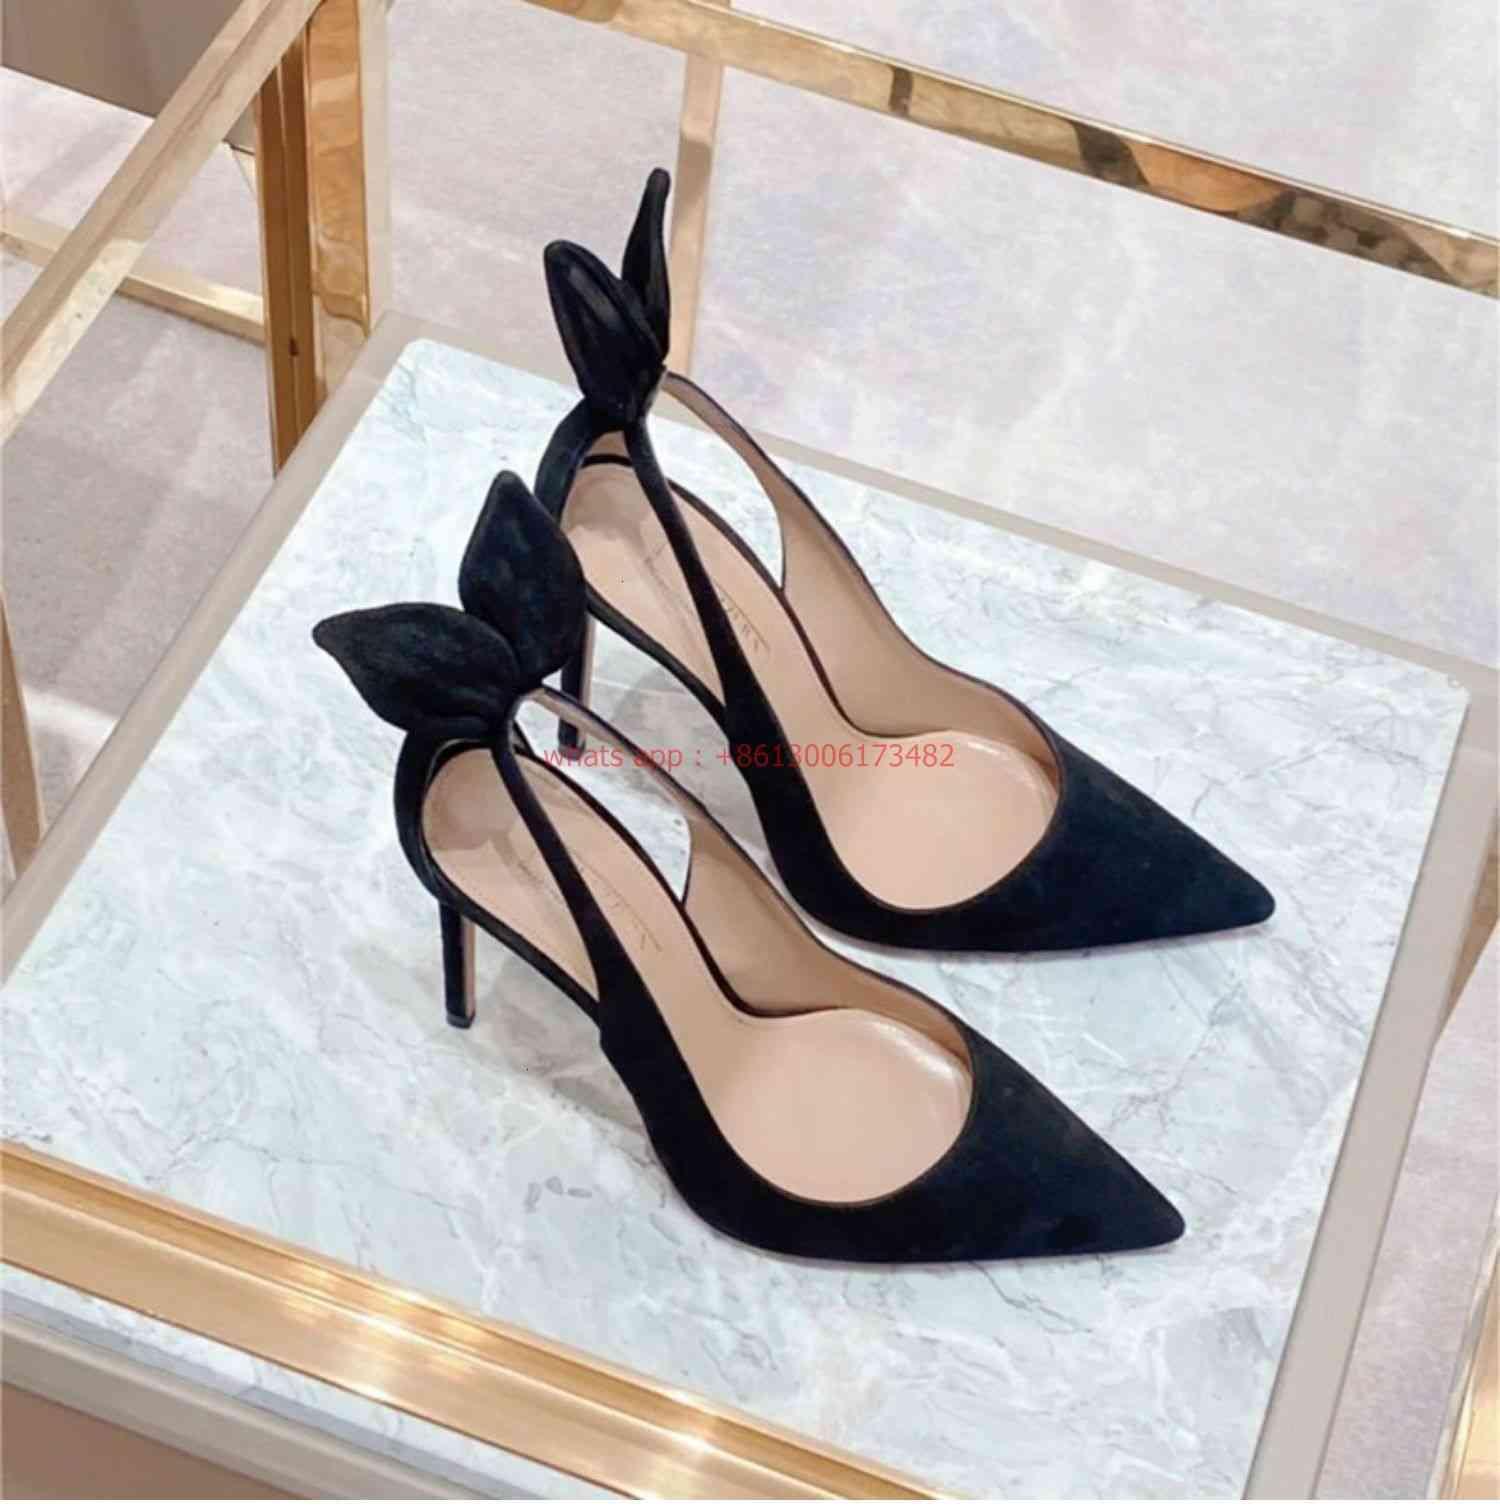 Sandálias Design Marca Bonito Ponto dedo-Tee Heels Bunny Ears Slingback High Heaver Woman Og41